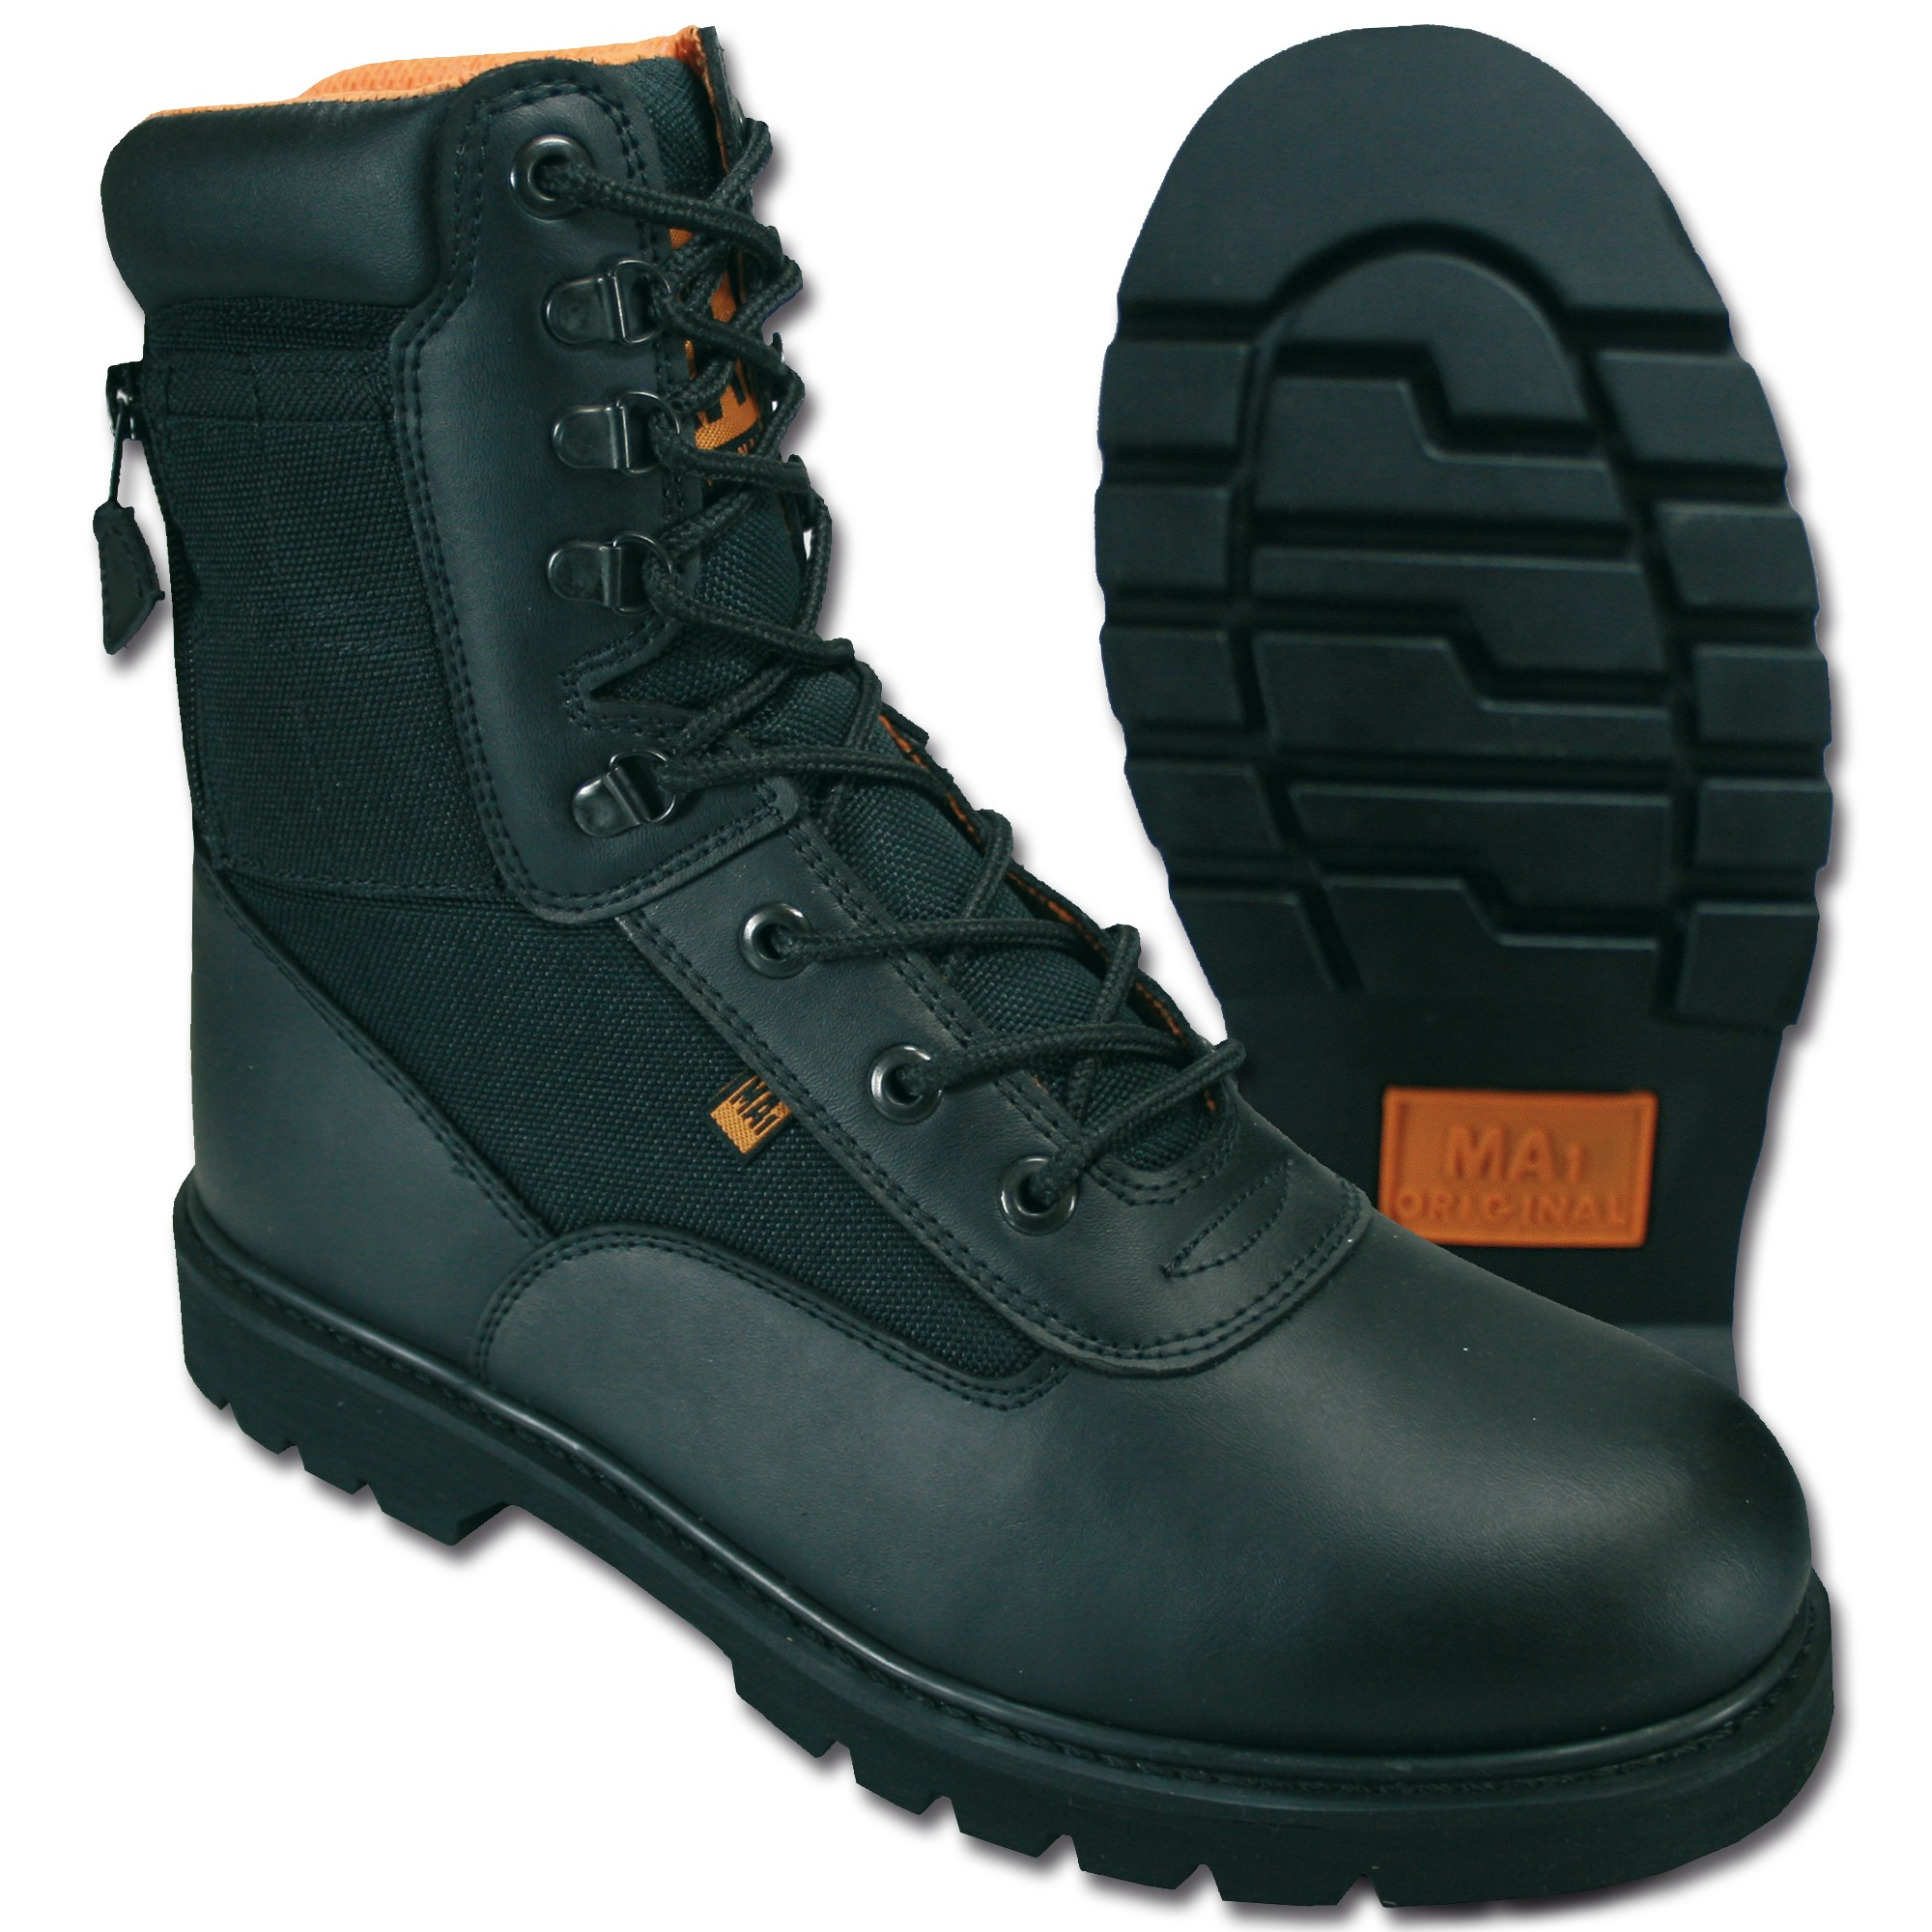 MA1 Boots